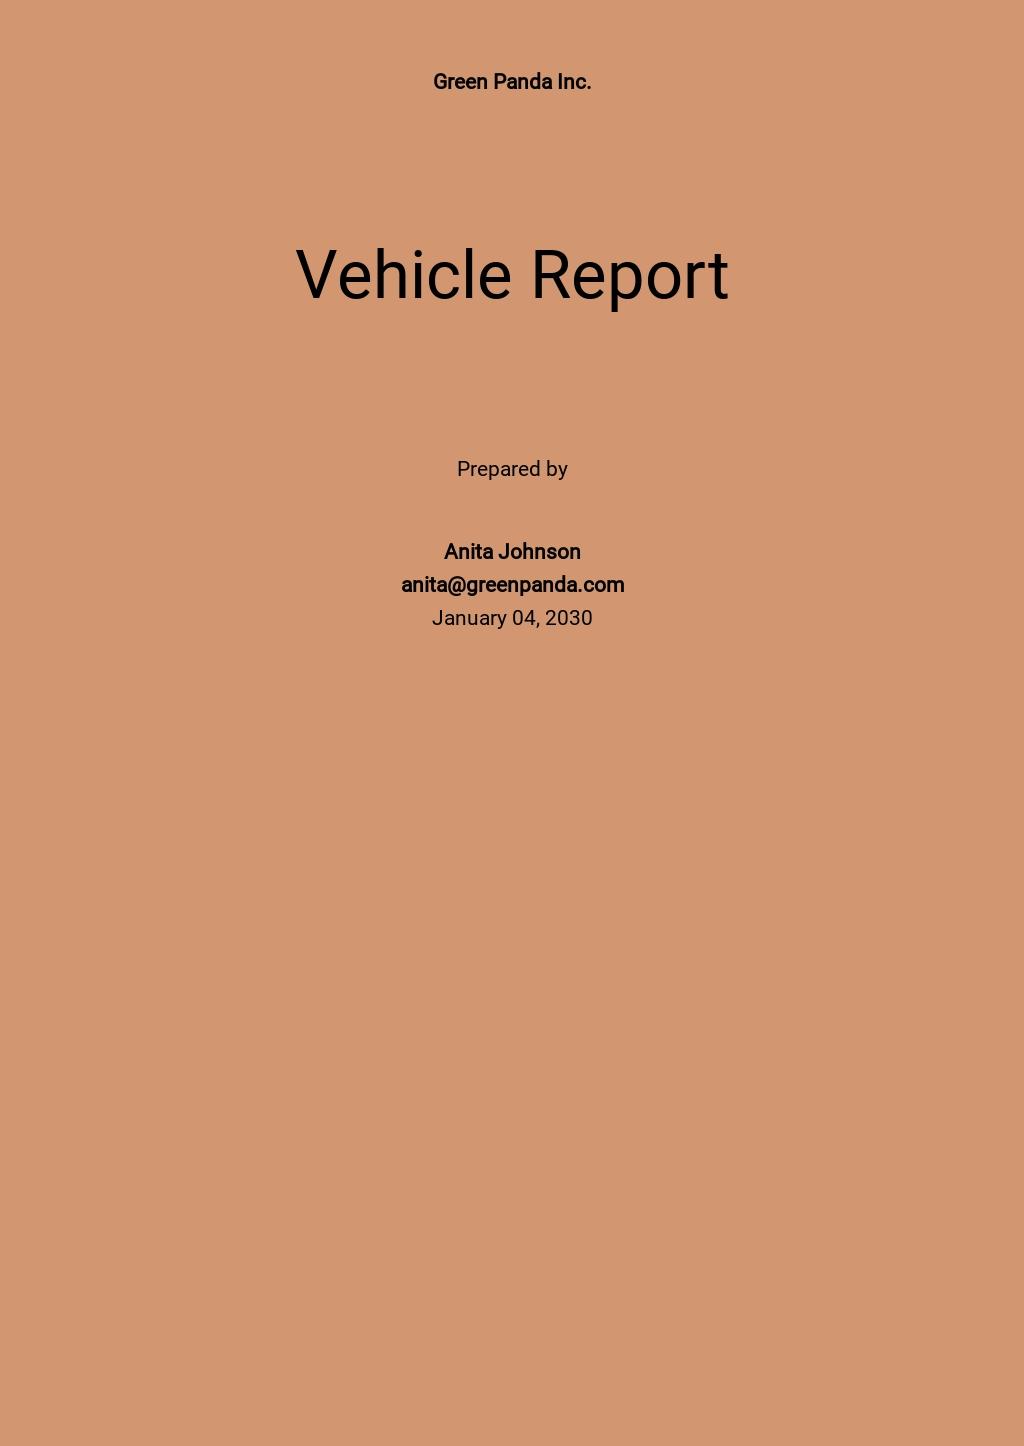 Vehicle Report Template.jpe